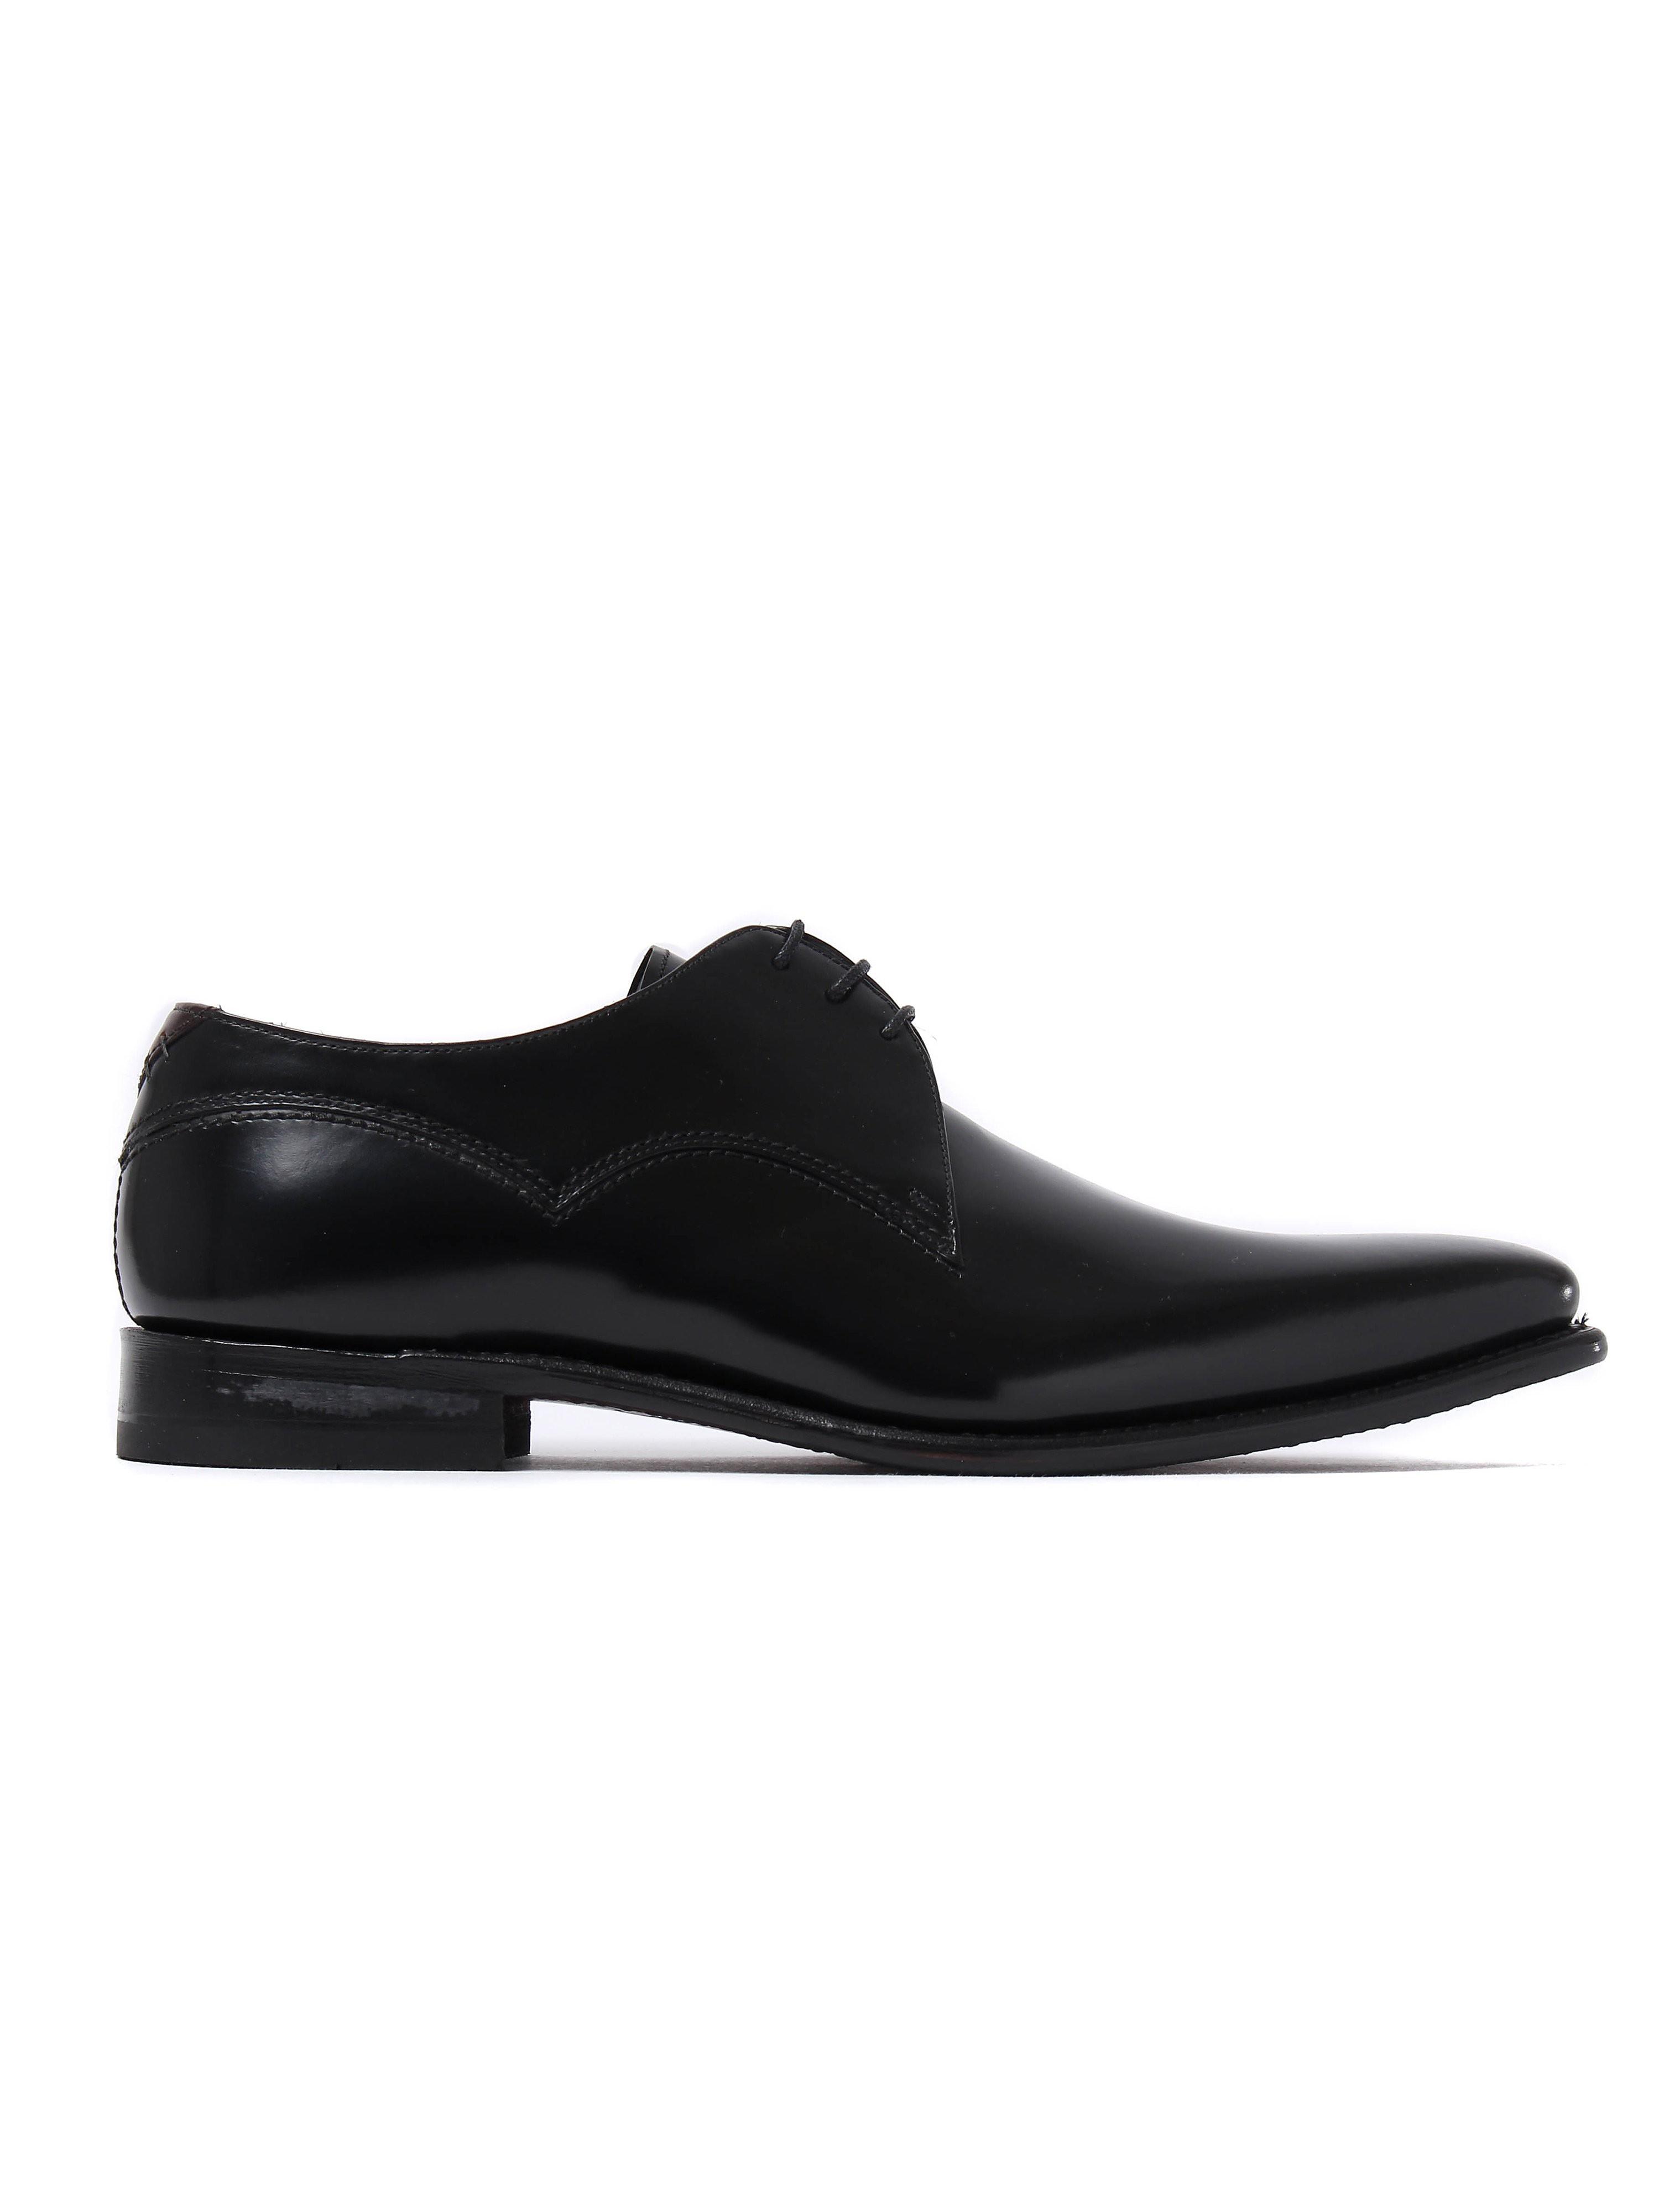 Barker Men's Connelly Patent Leather Derby Shoes - Black